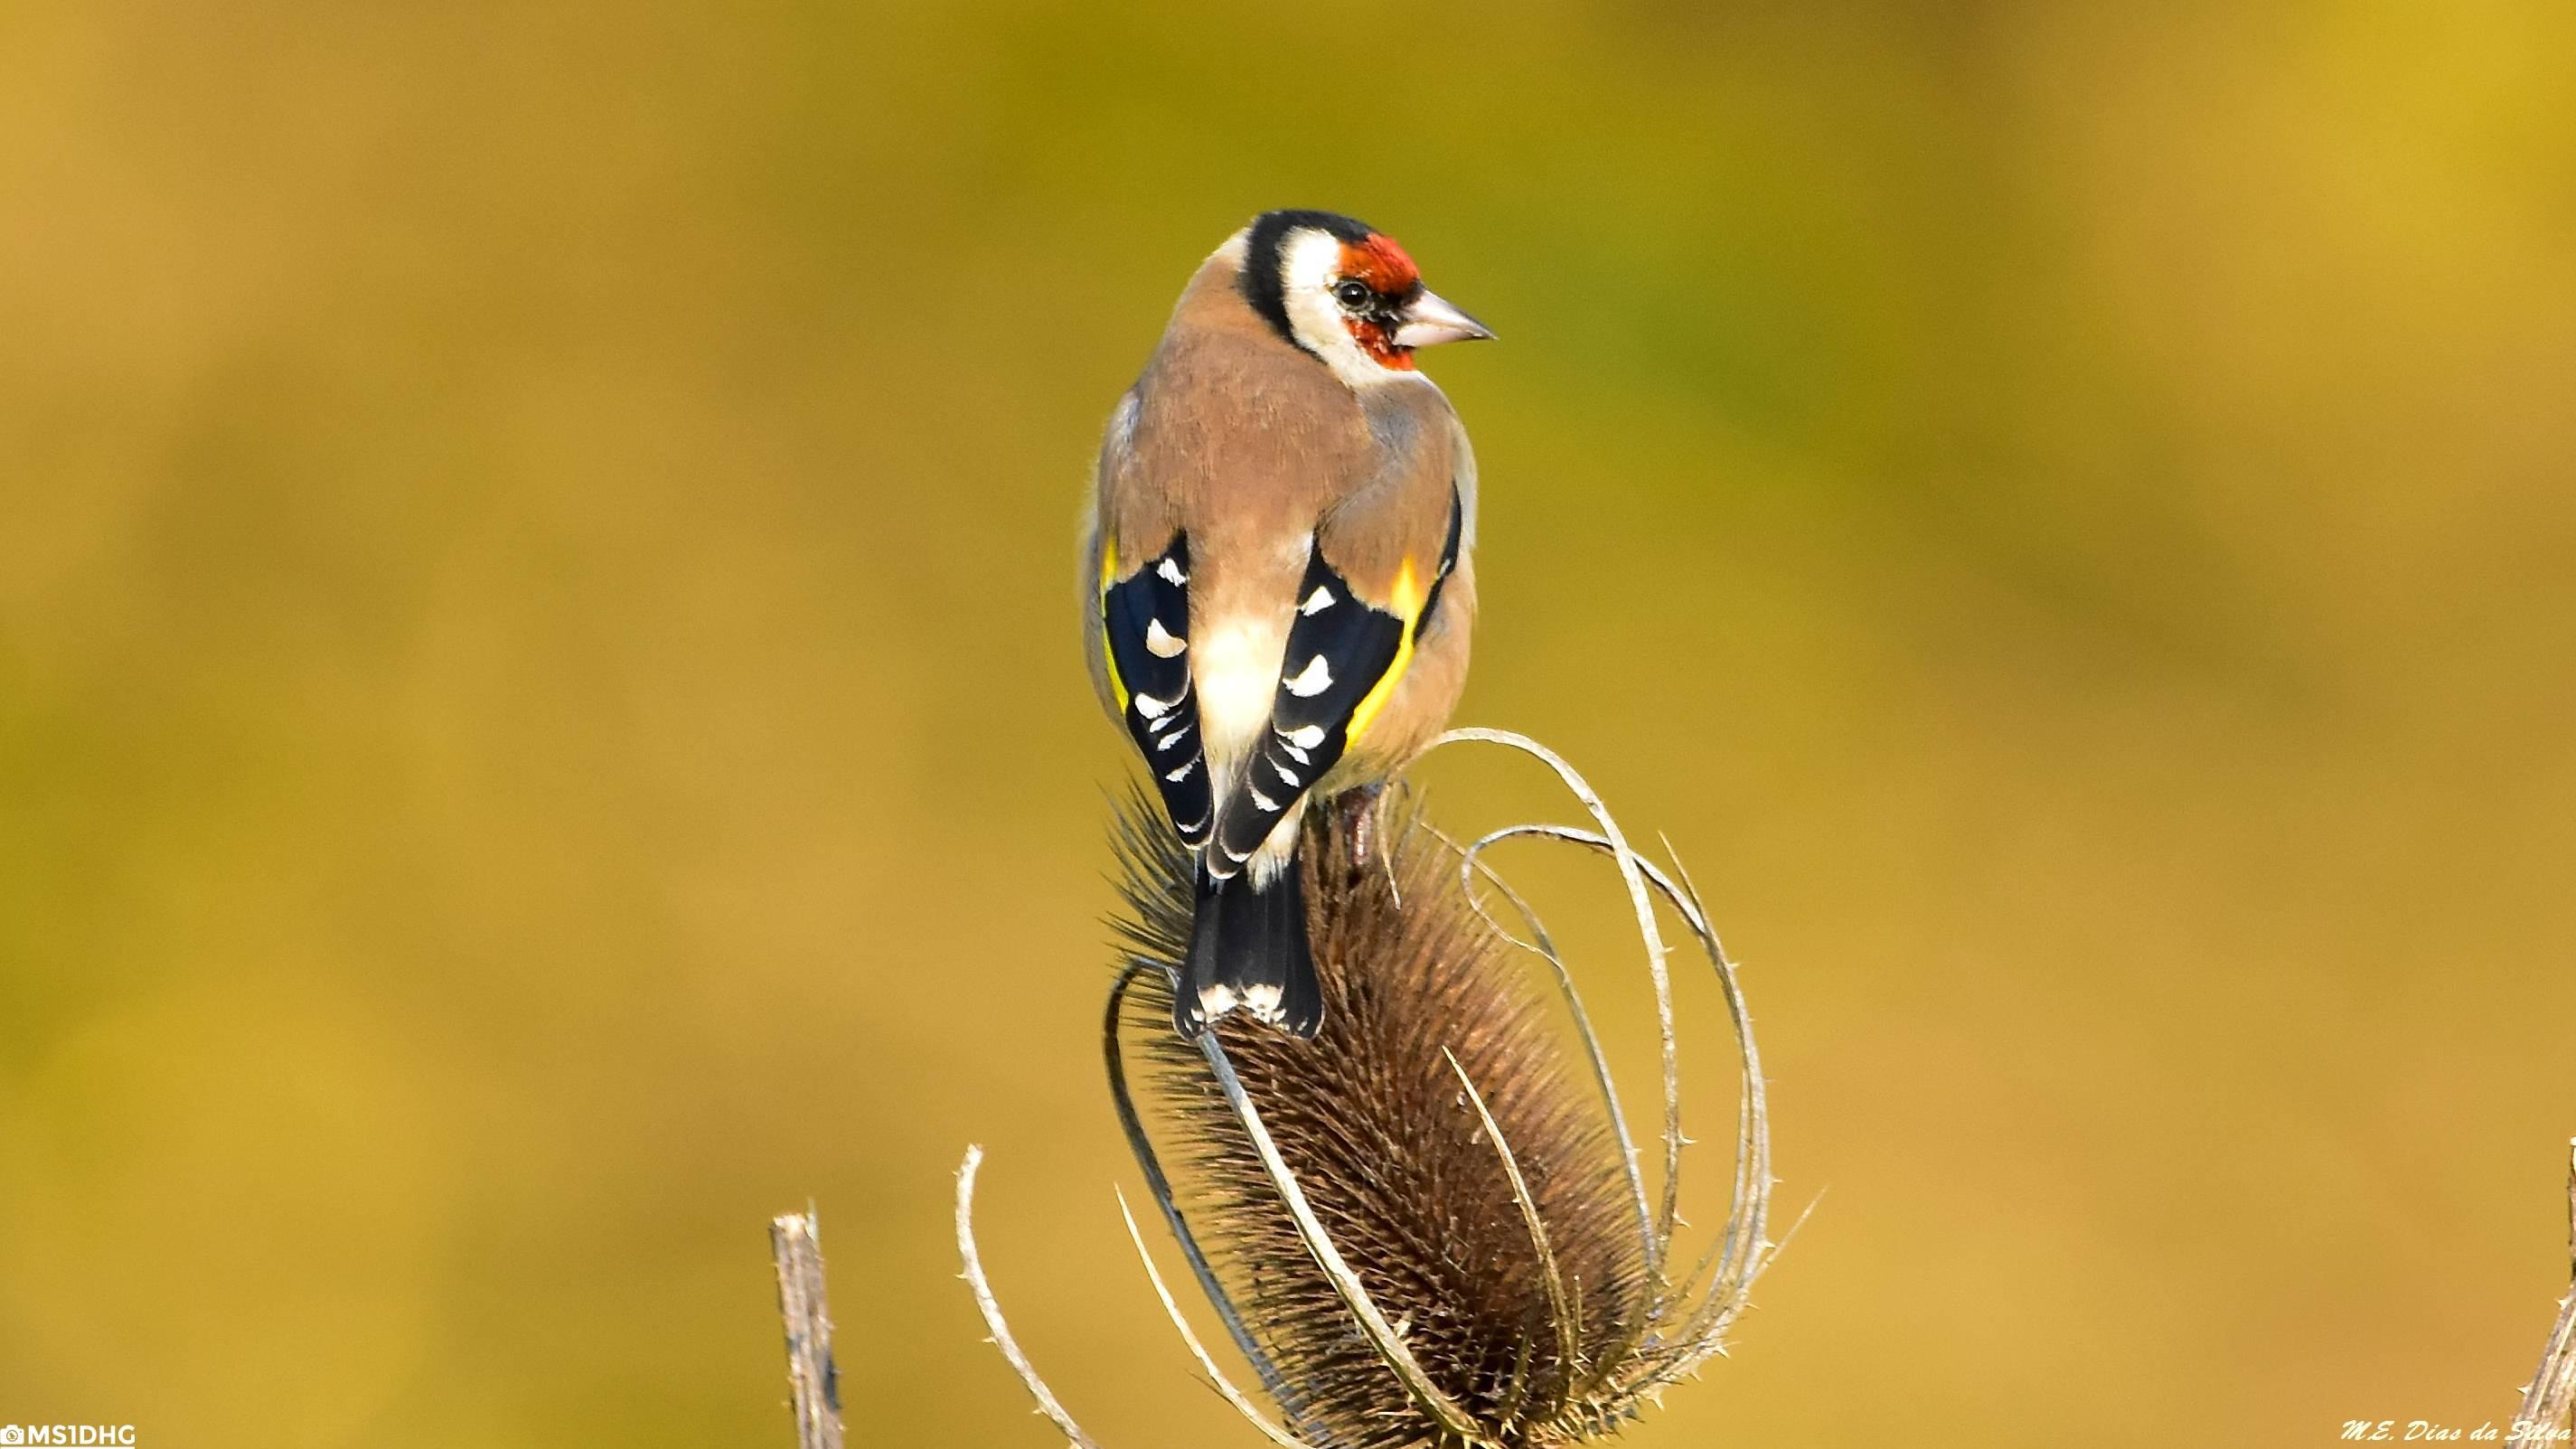 Fórum Aves - Birdwatching em Portugal - Portal Pintassilgo%20(26)